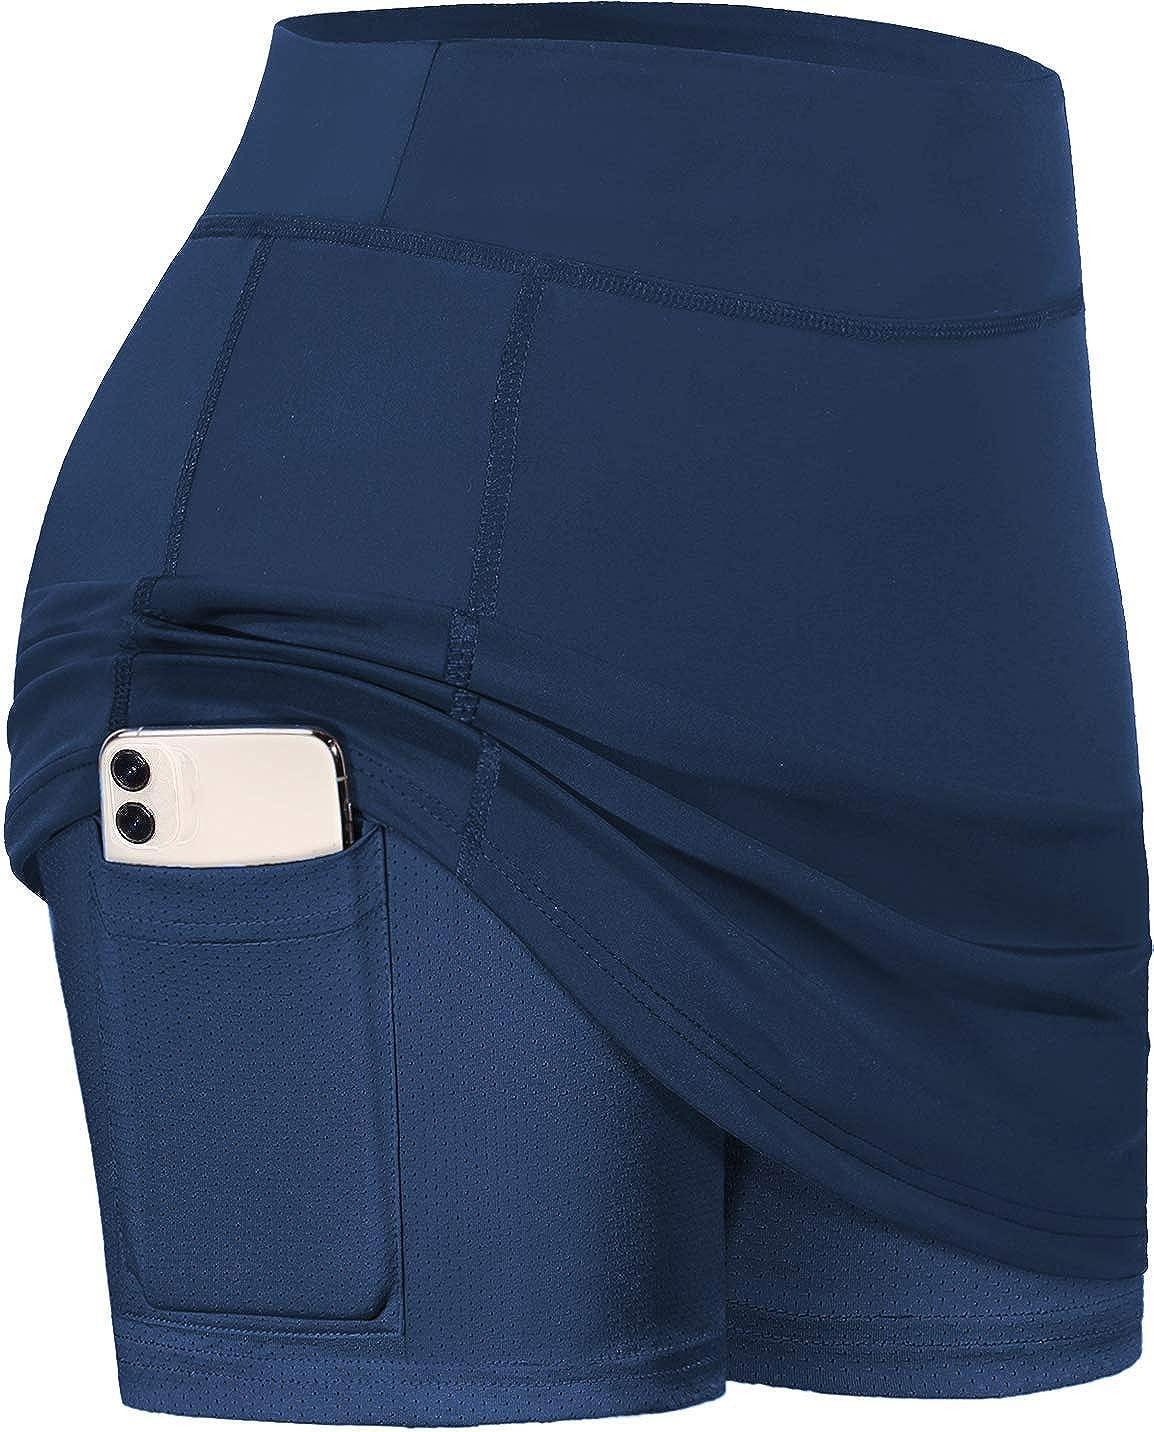 tochispa Women Tennis online shopping Skirts with Waist Running Pocket Elastic Sacramento Mall G